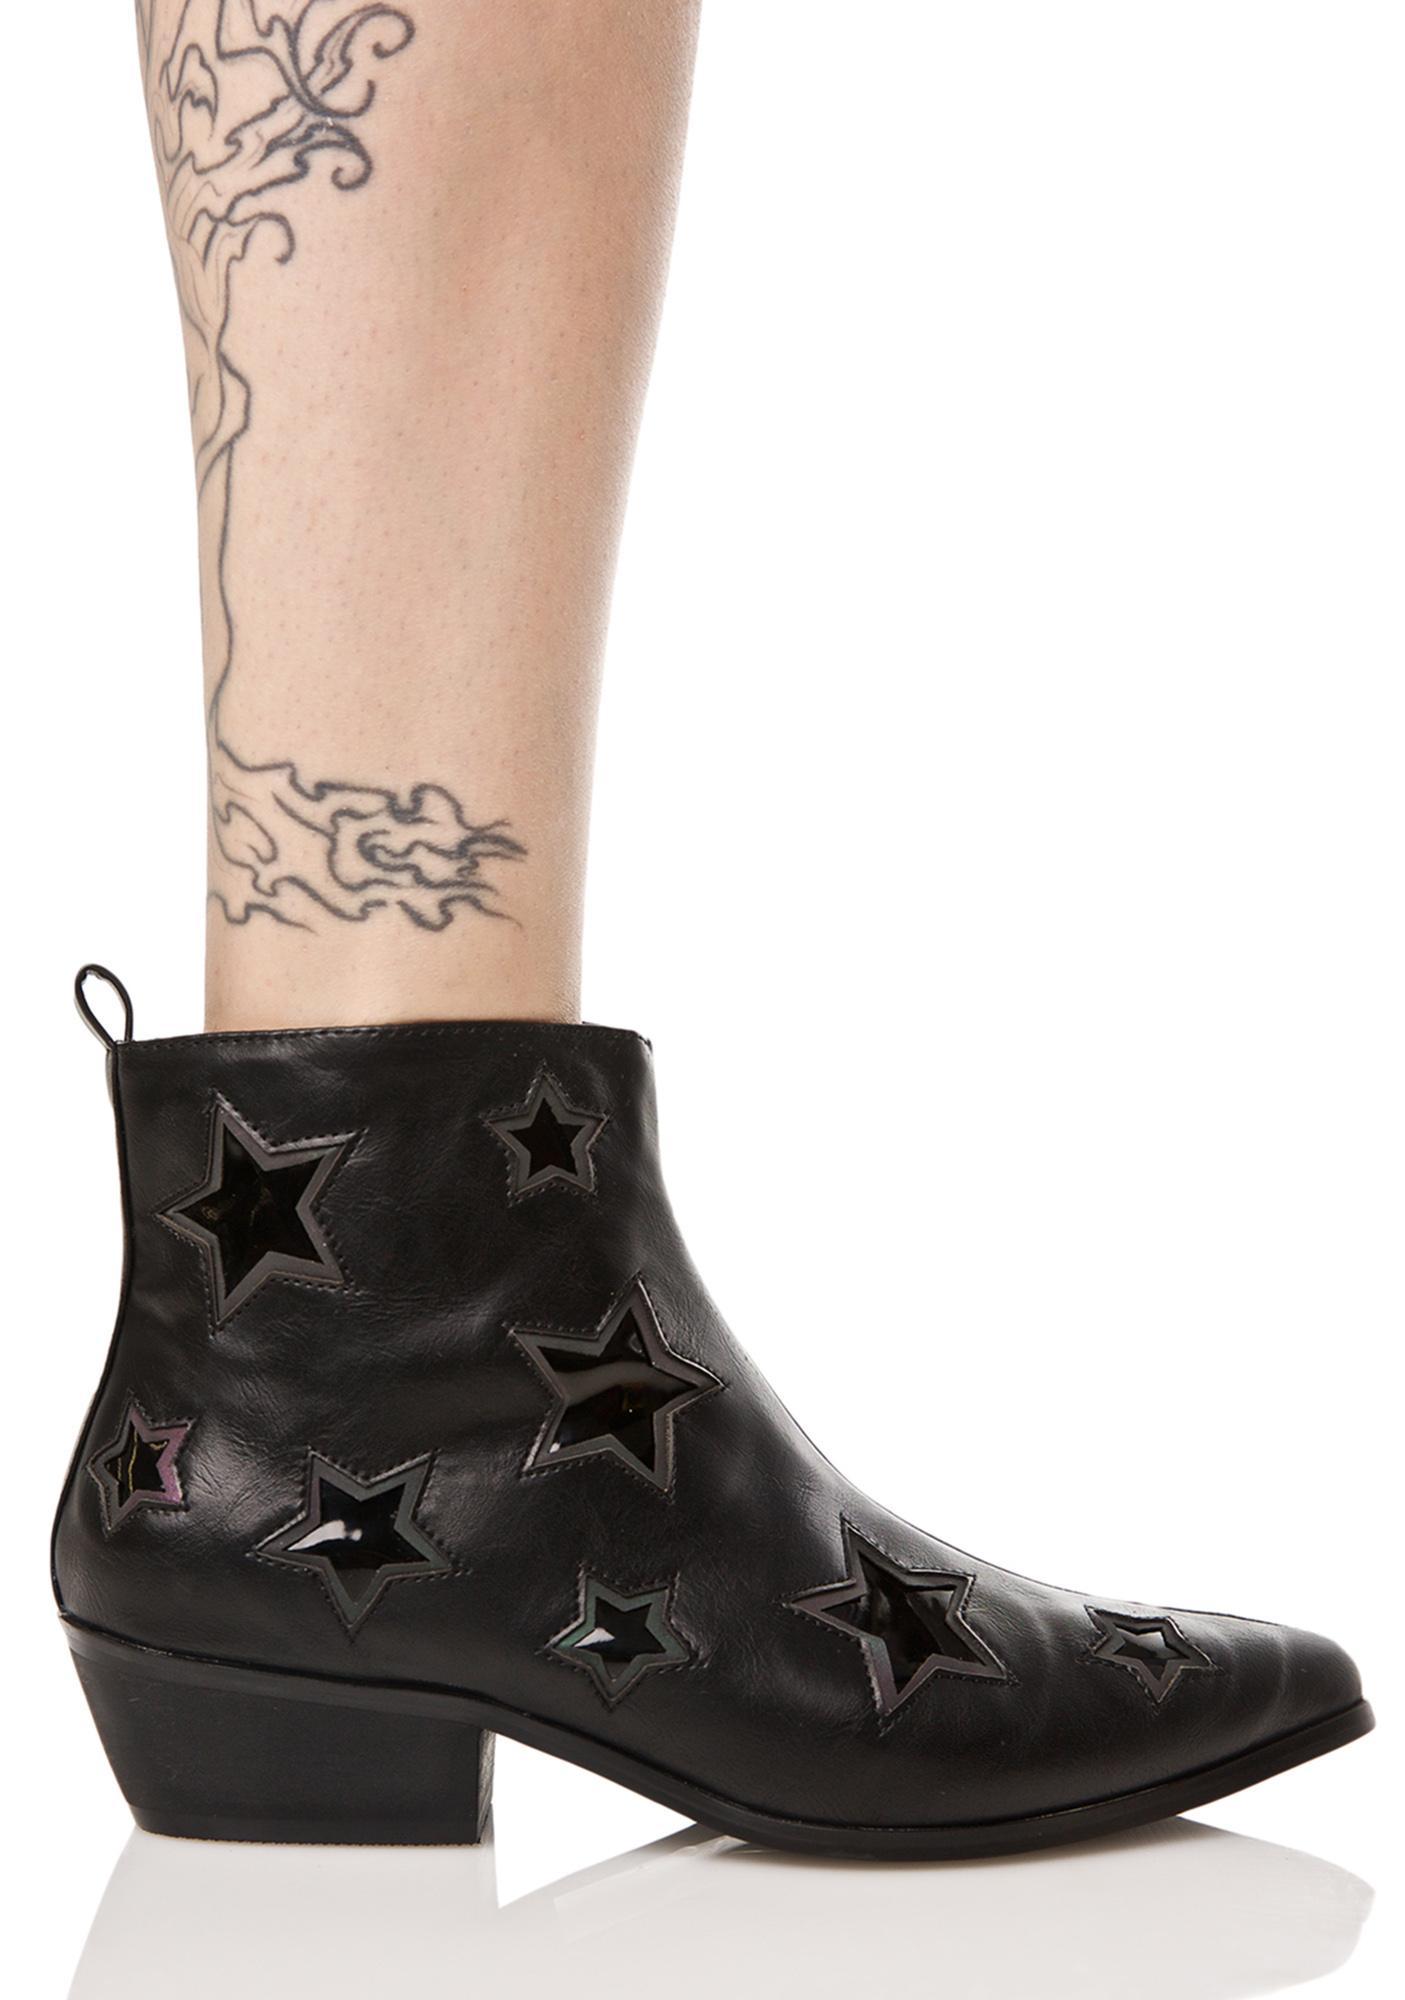 Y.R.U. Laso Stars Reflective Boots